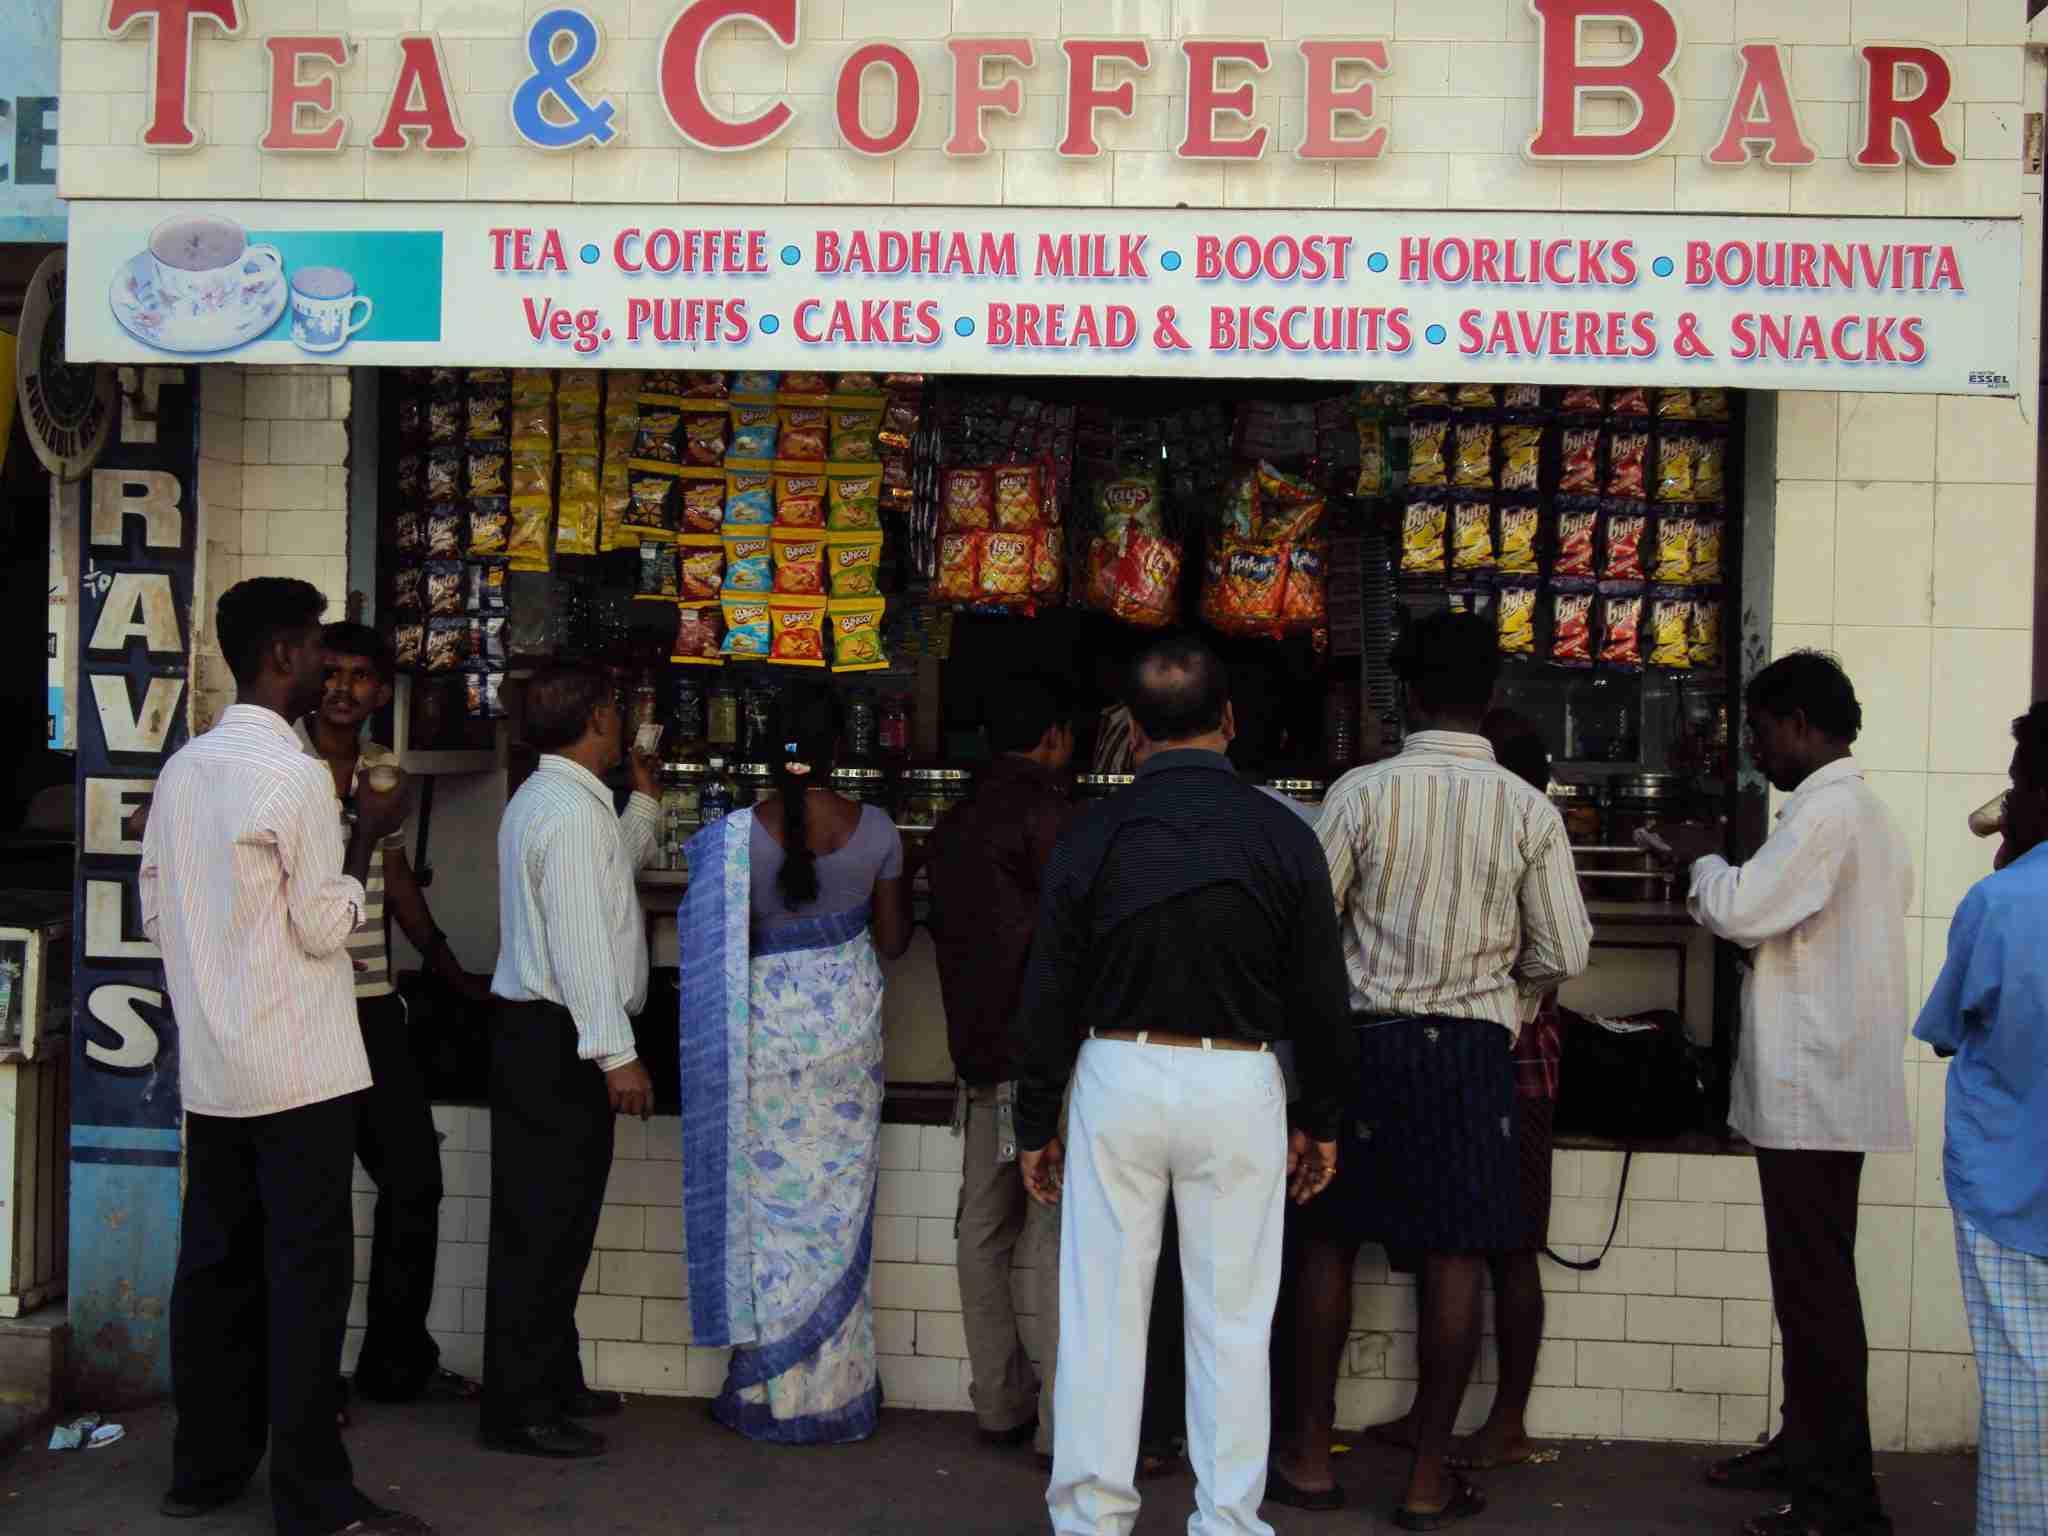 Tea & Coffee Bar